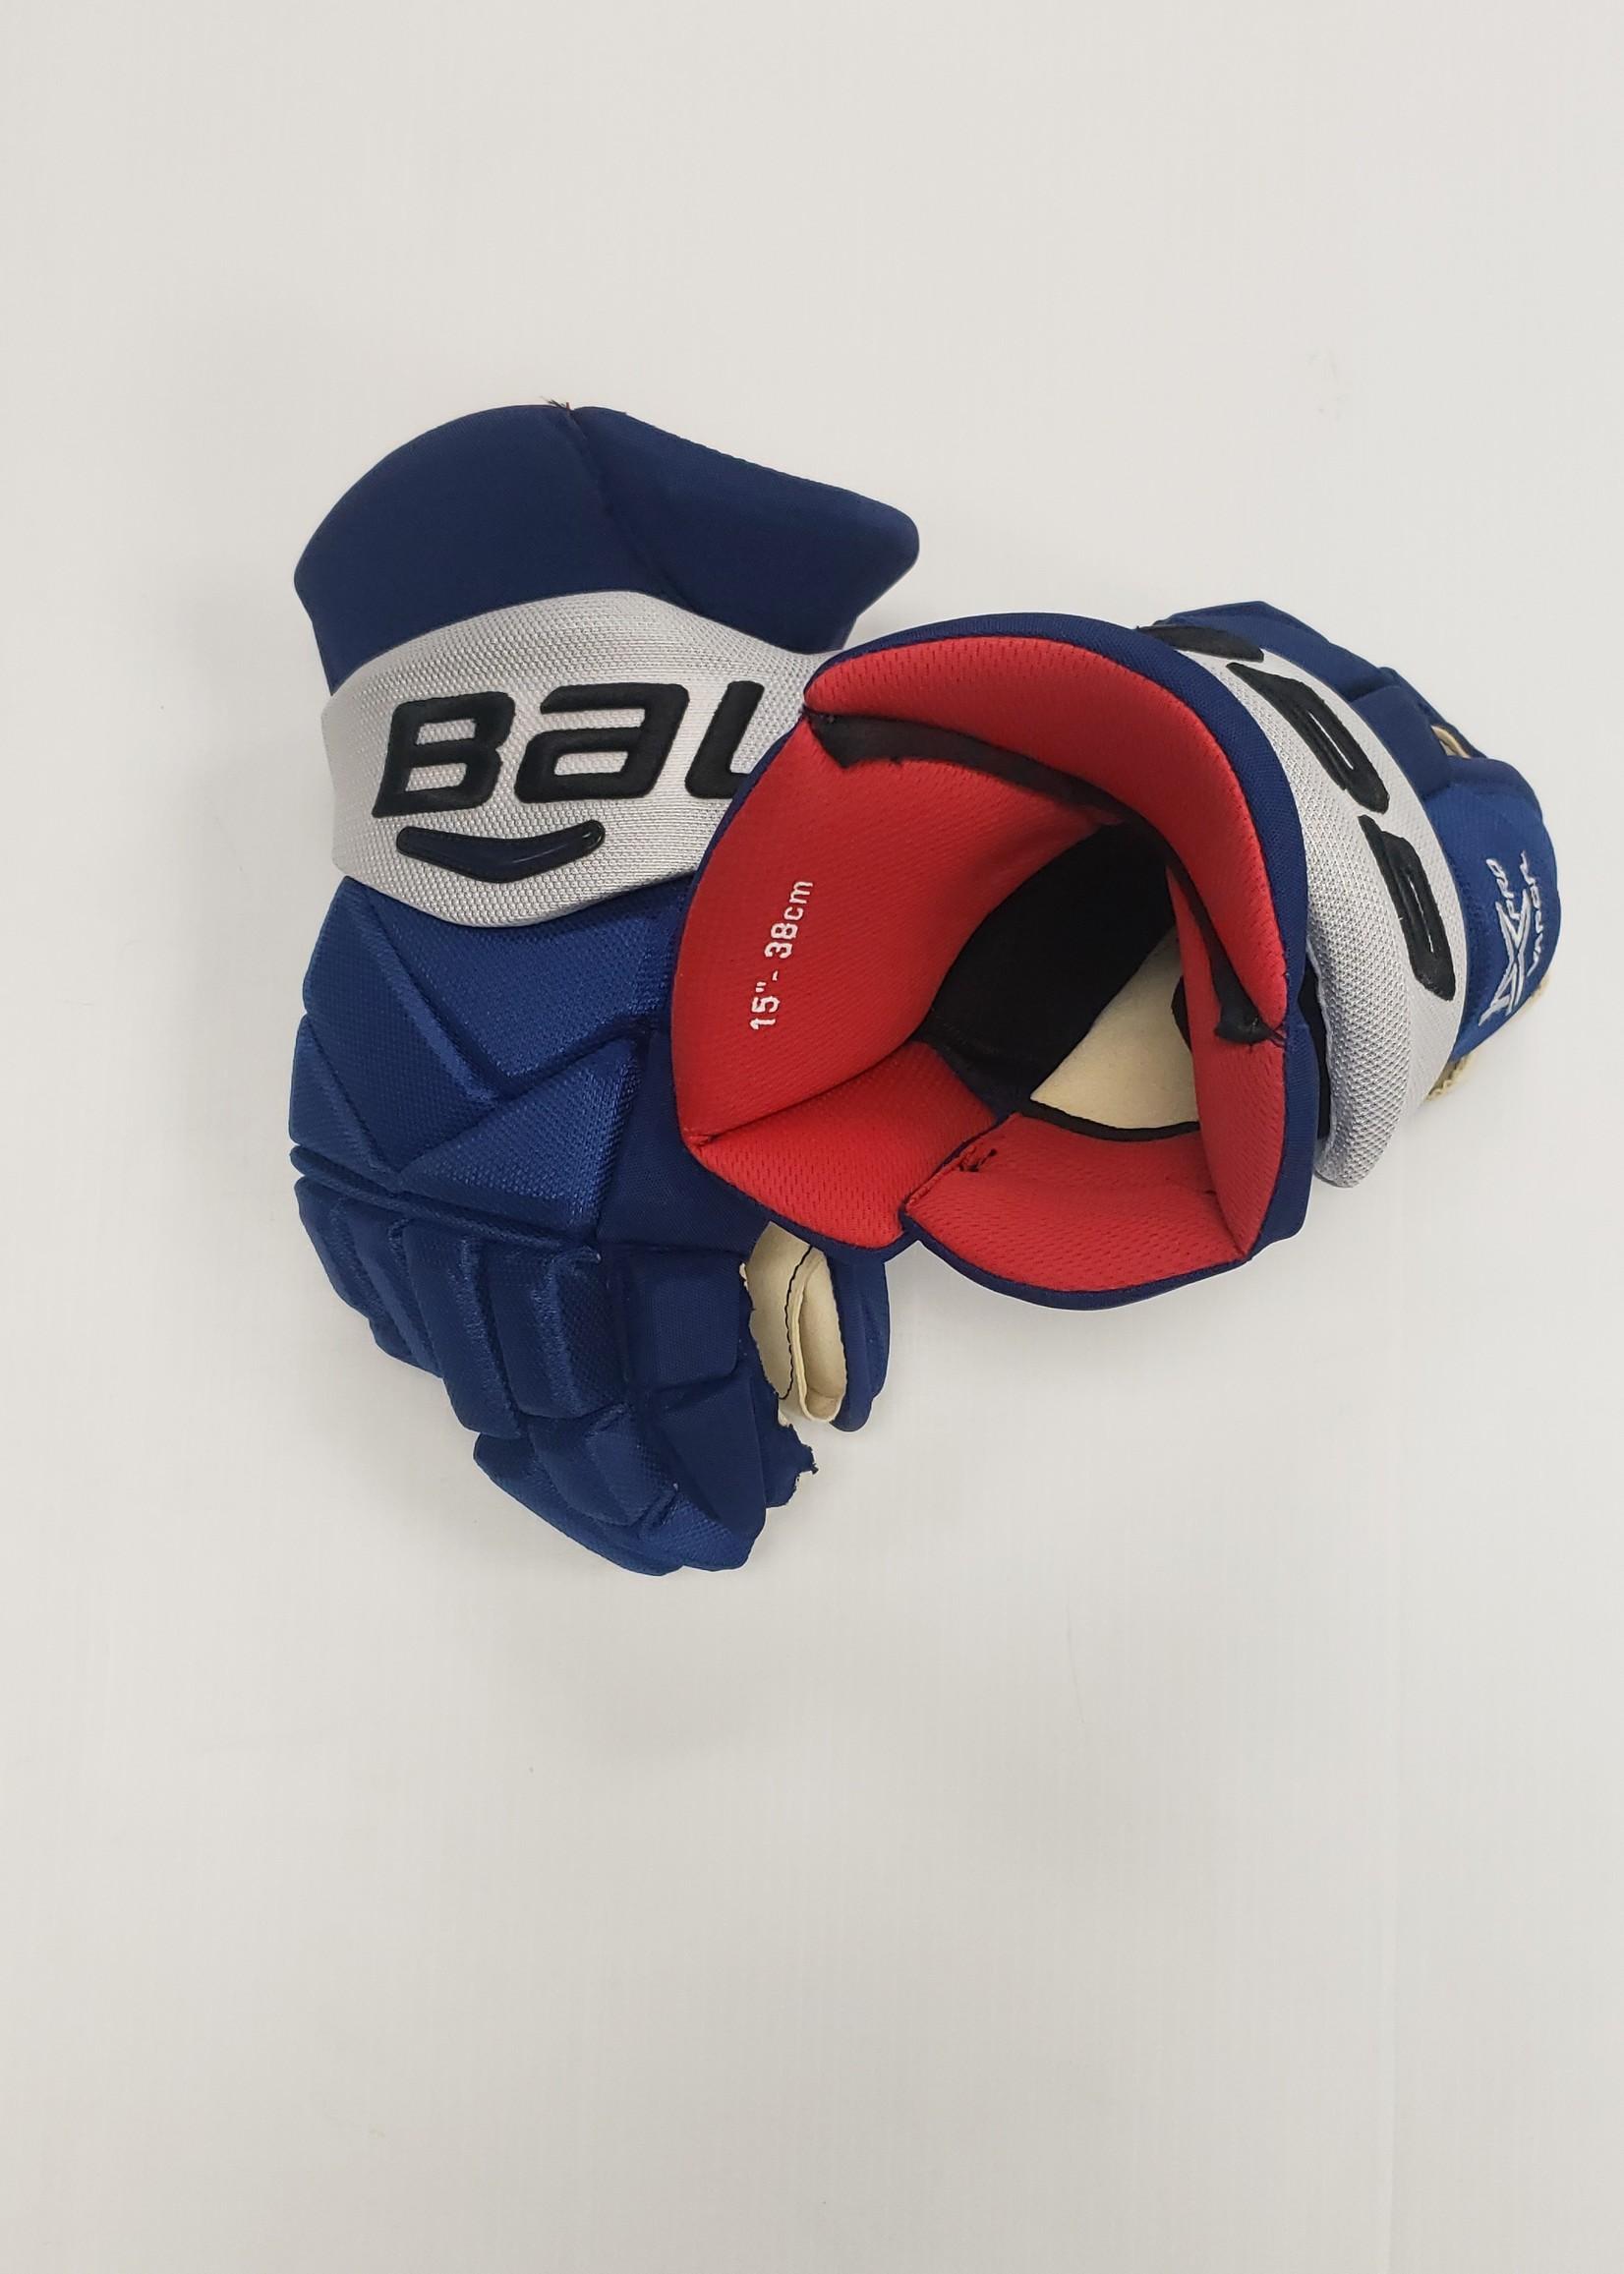 "Bauer Vapor 1X Pro 15"" Pro Stock Hockey Gloves - Brian Boyle Tampa Bay Lightning"